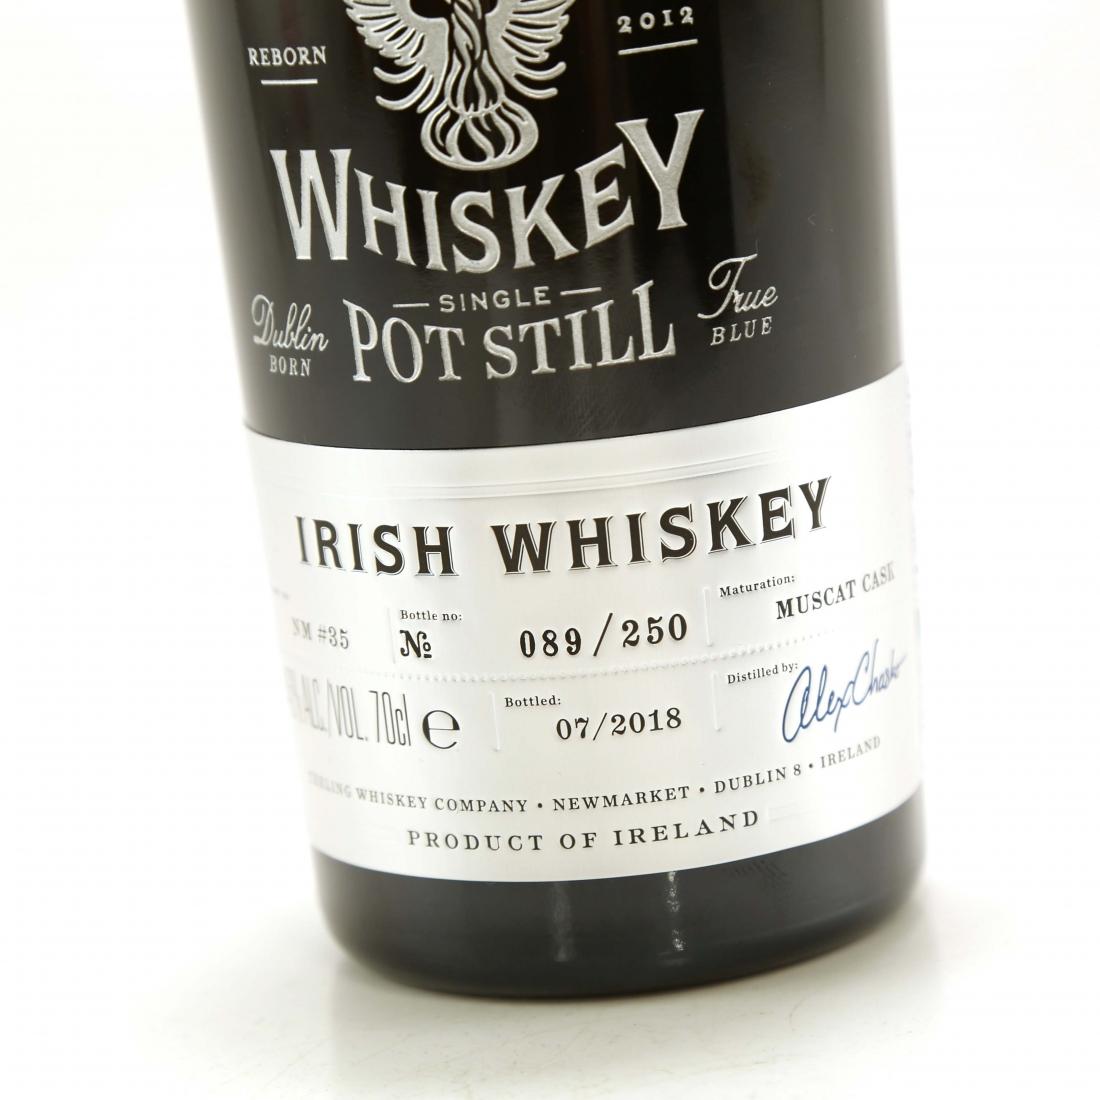 Teeling Celebratory Single Pot Still Whiskey / Bottle #089